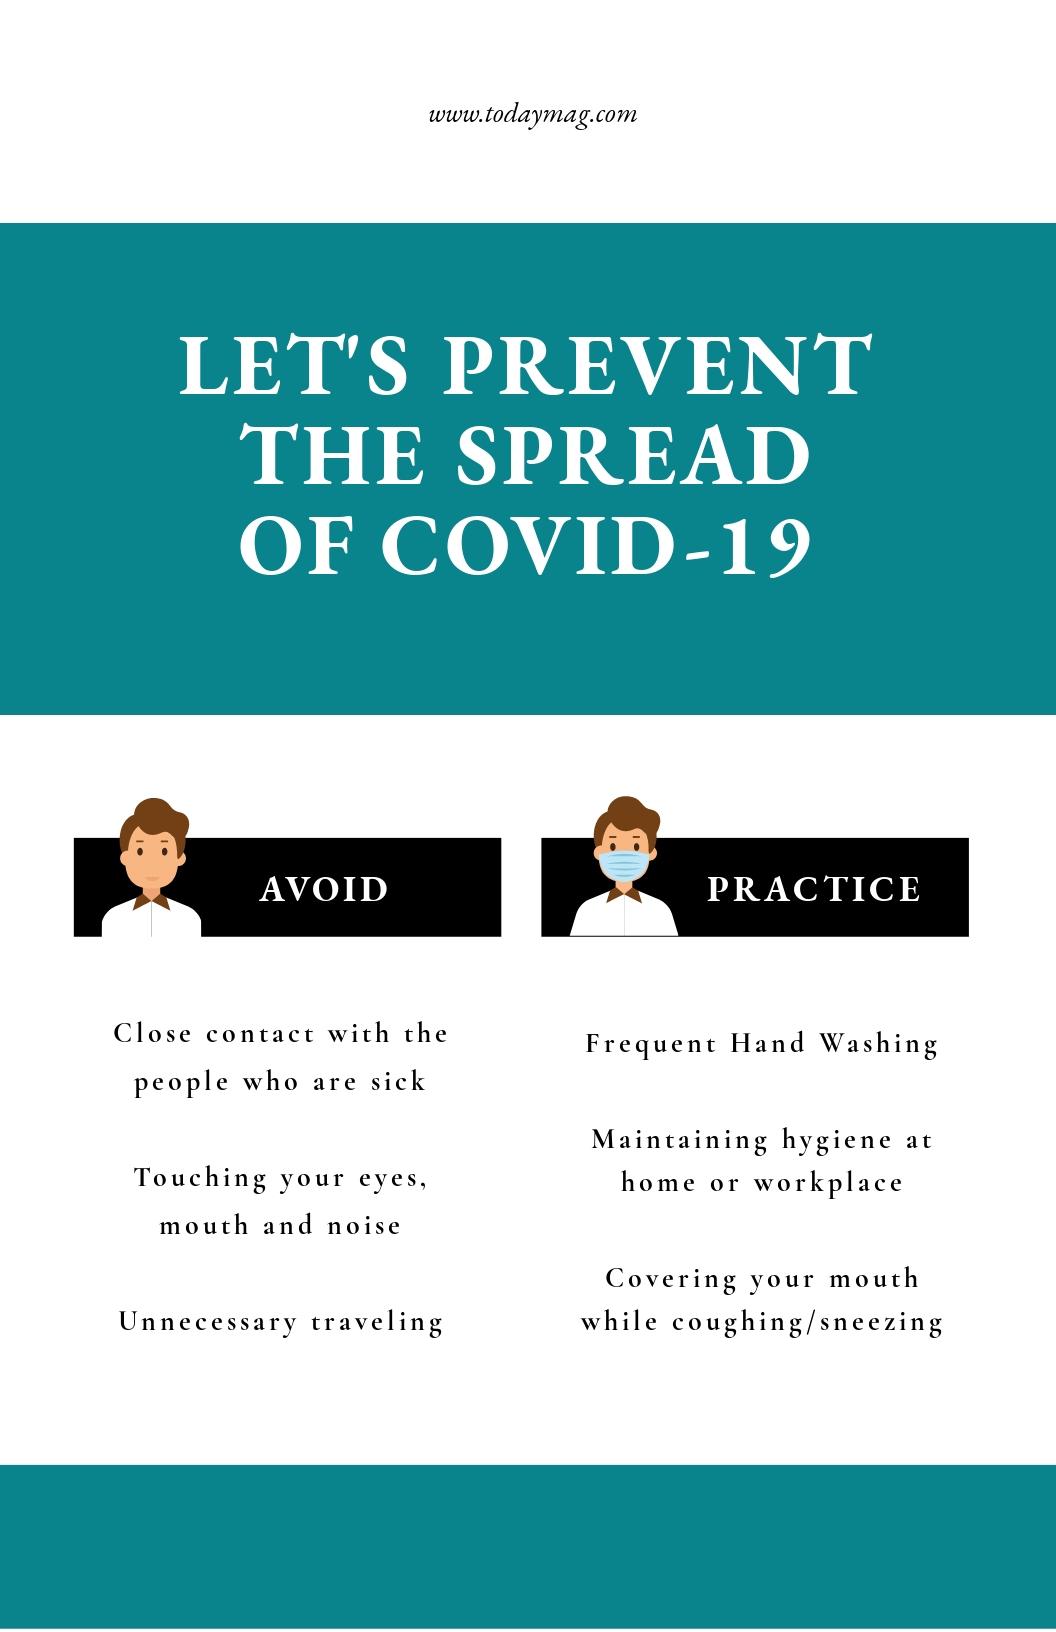 Coronavirus COVID-19 Prevention Social Media Poster Template